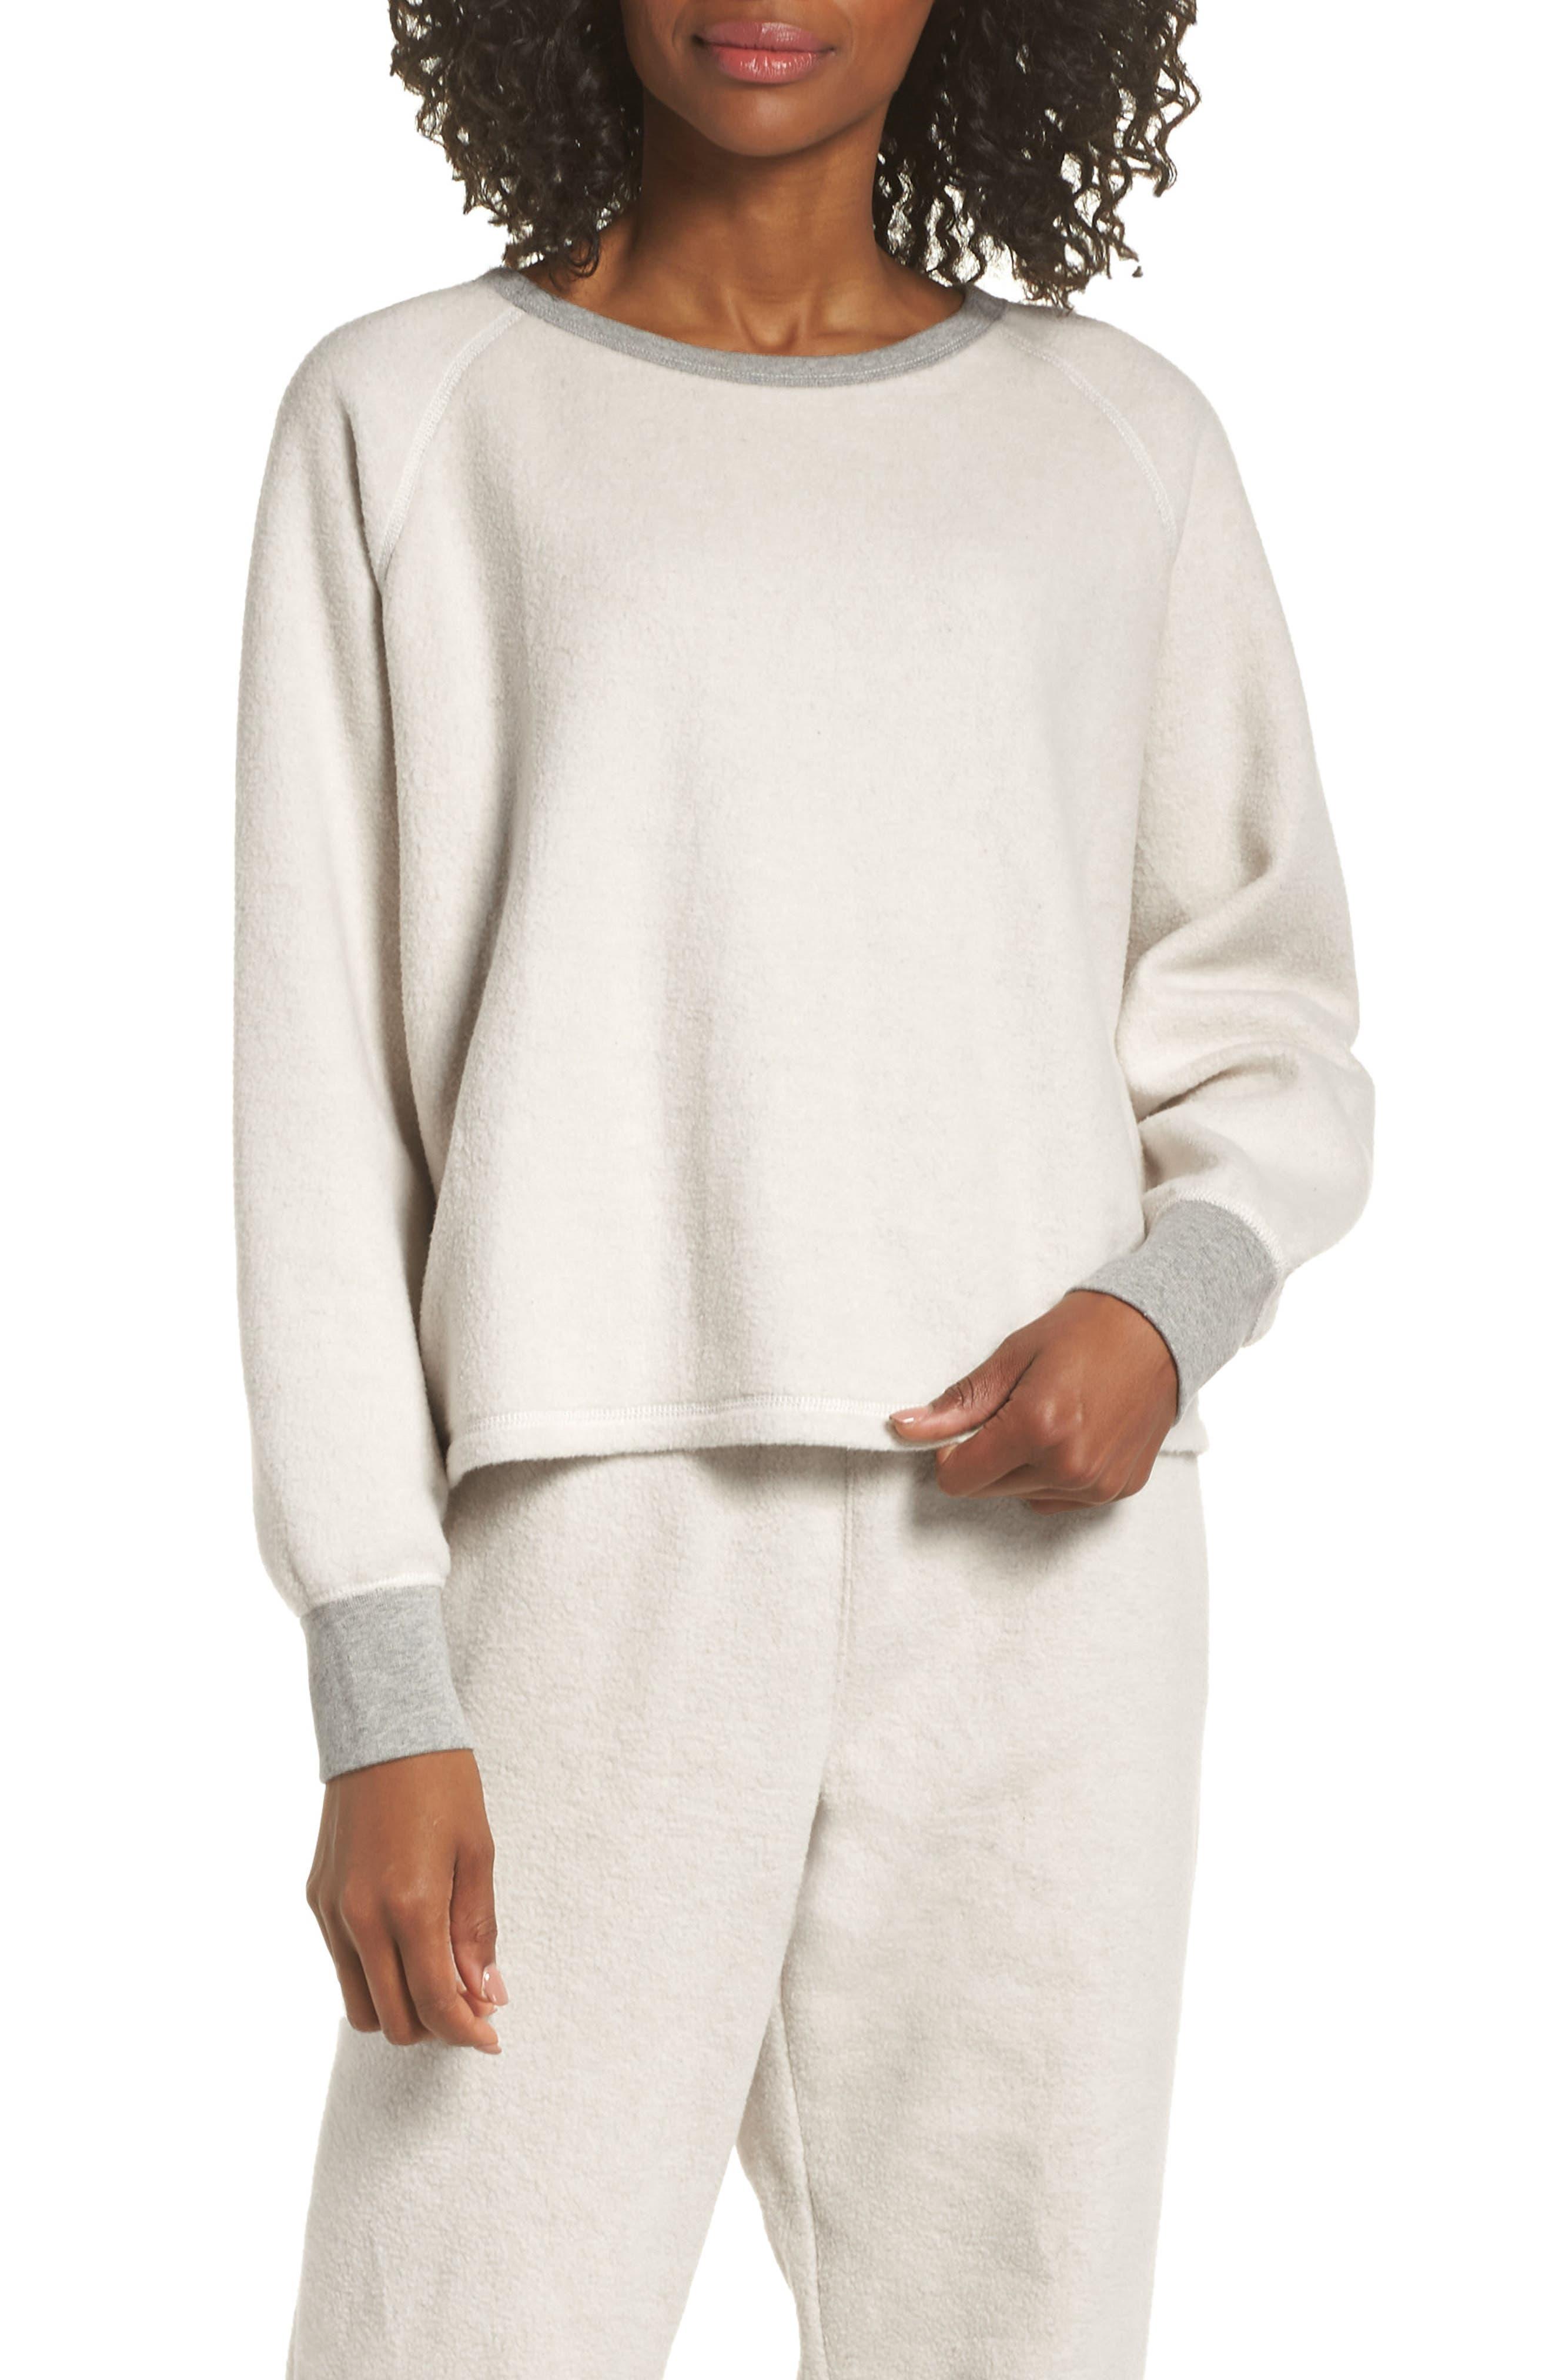 MADEWELL Fleece Pajama Sweatshirt, Main, color, 020